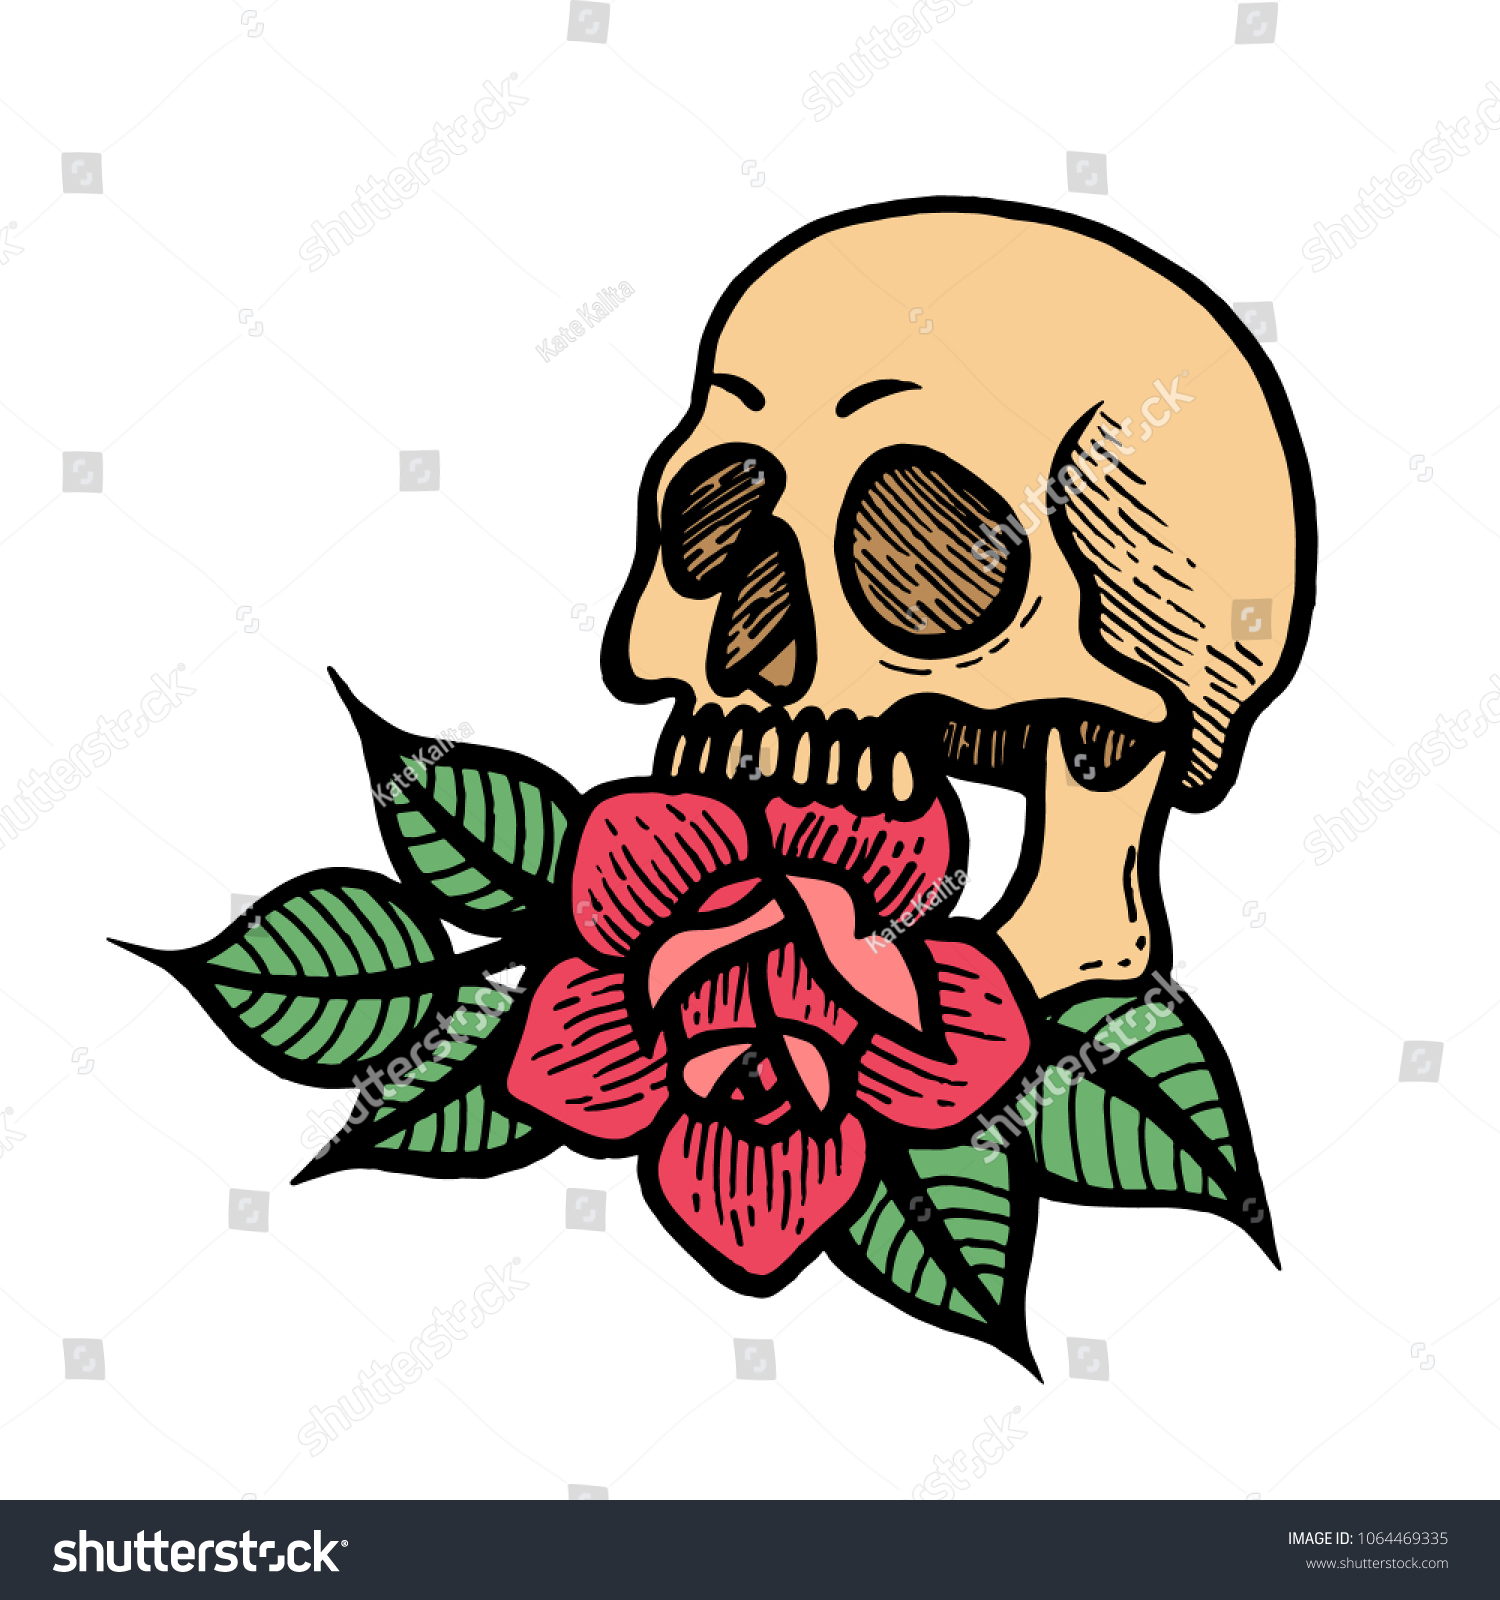 Old School Rose Tattoo Skull Traditional Stock Vector Royalty Free